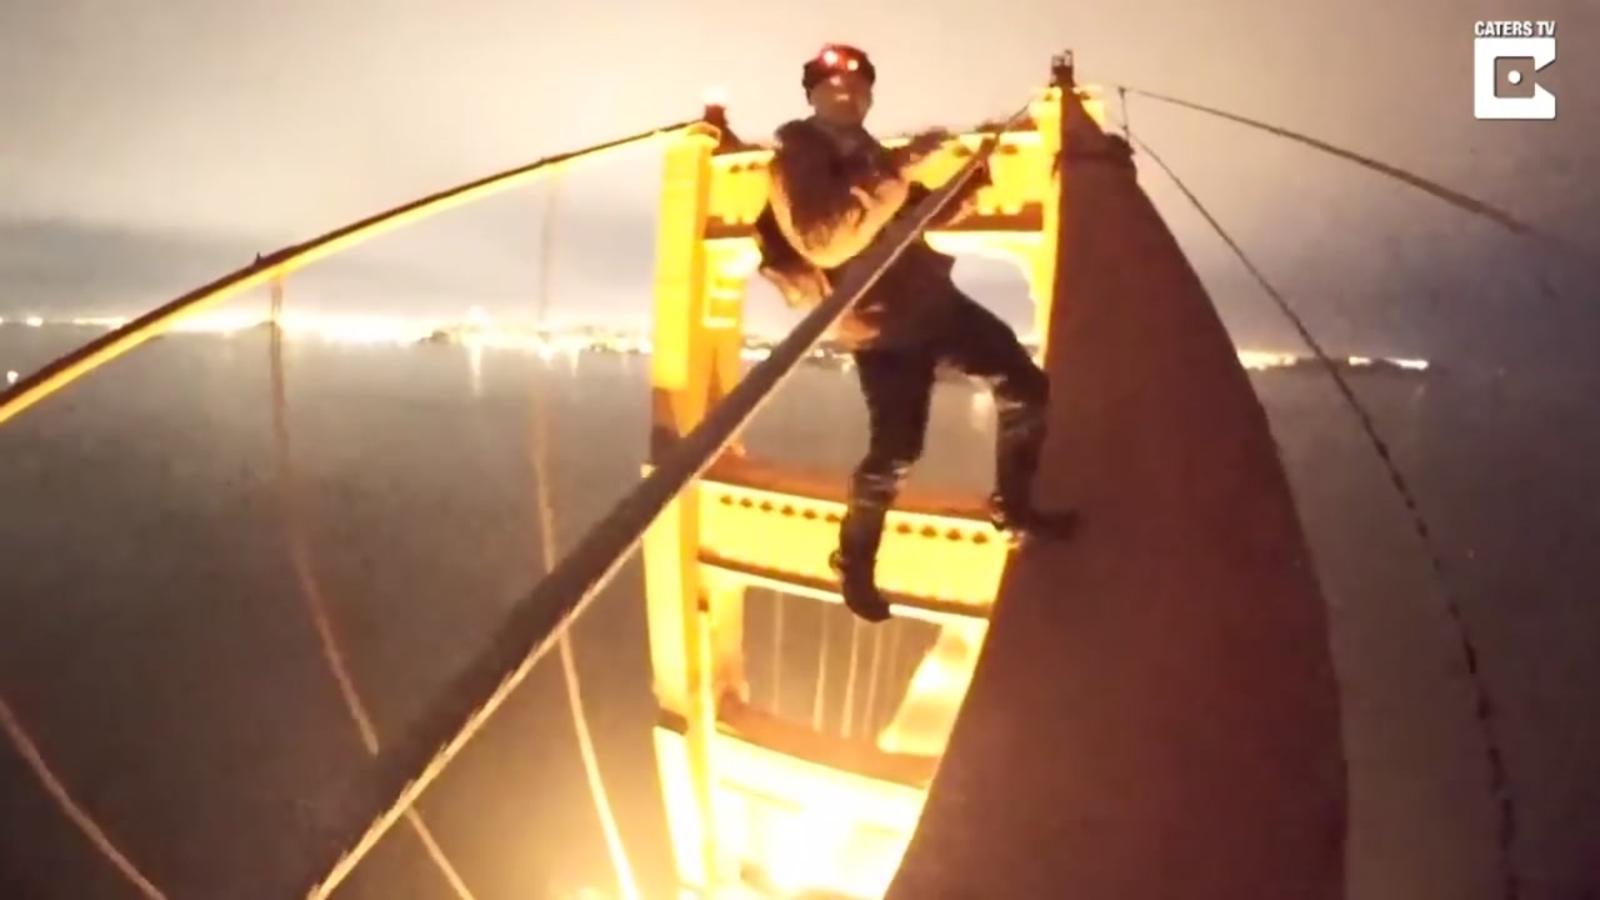 Golden Gate Bridge Officials Upgrade Security Measures